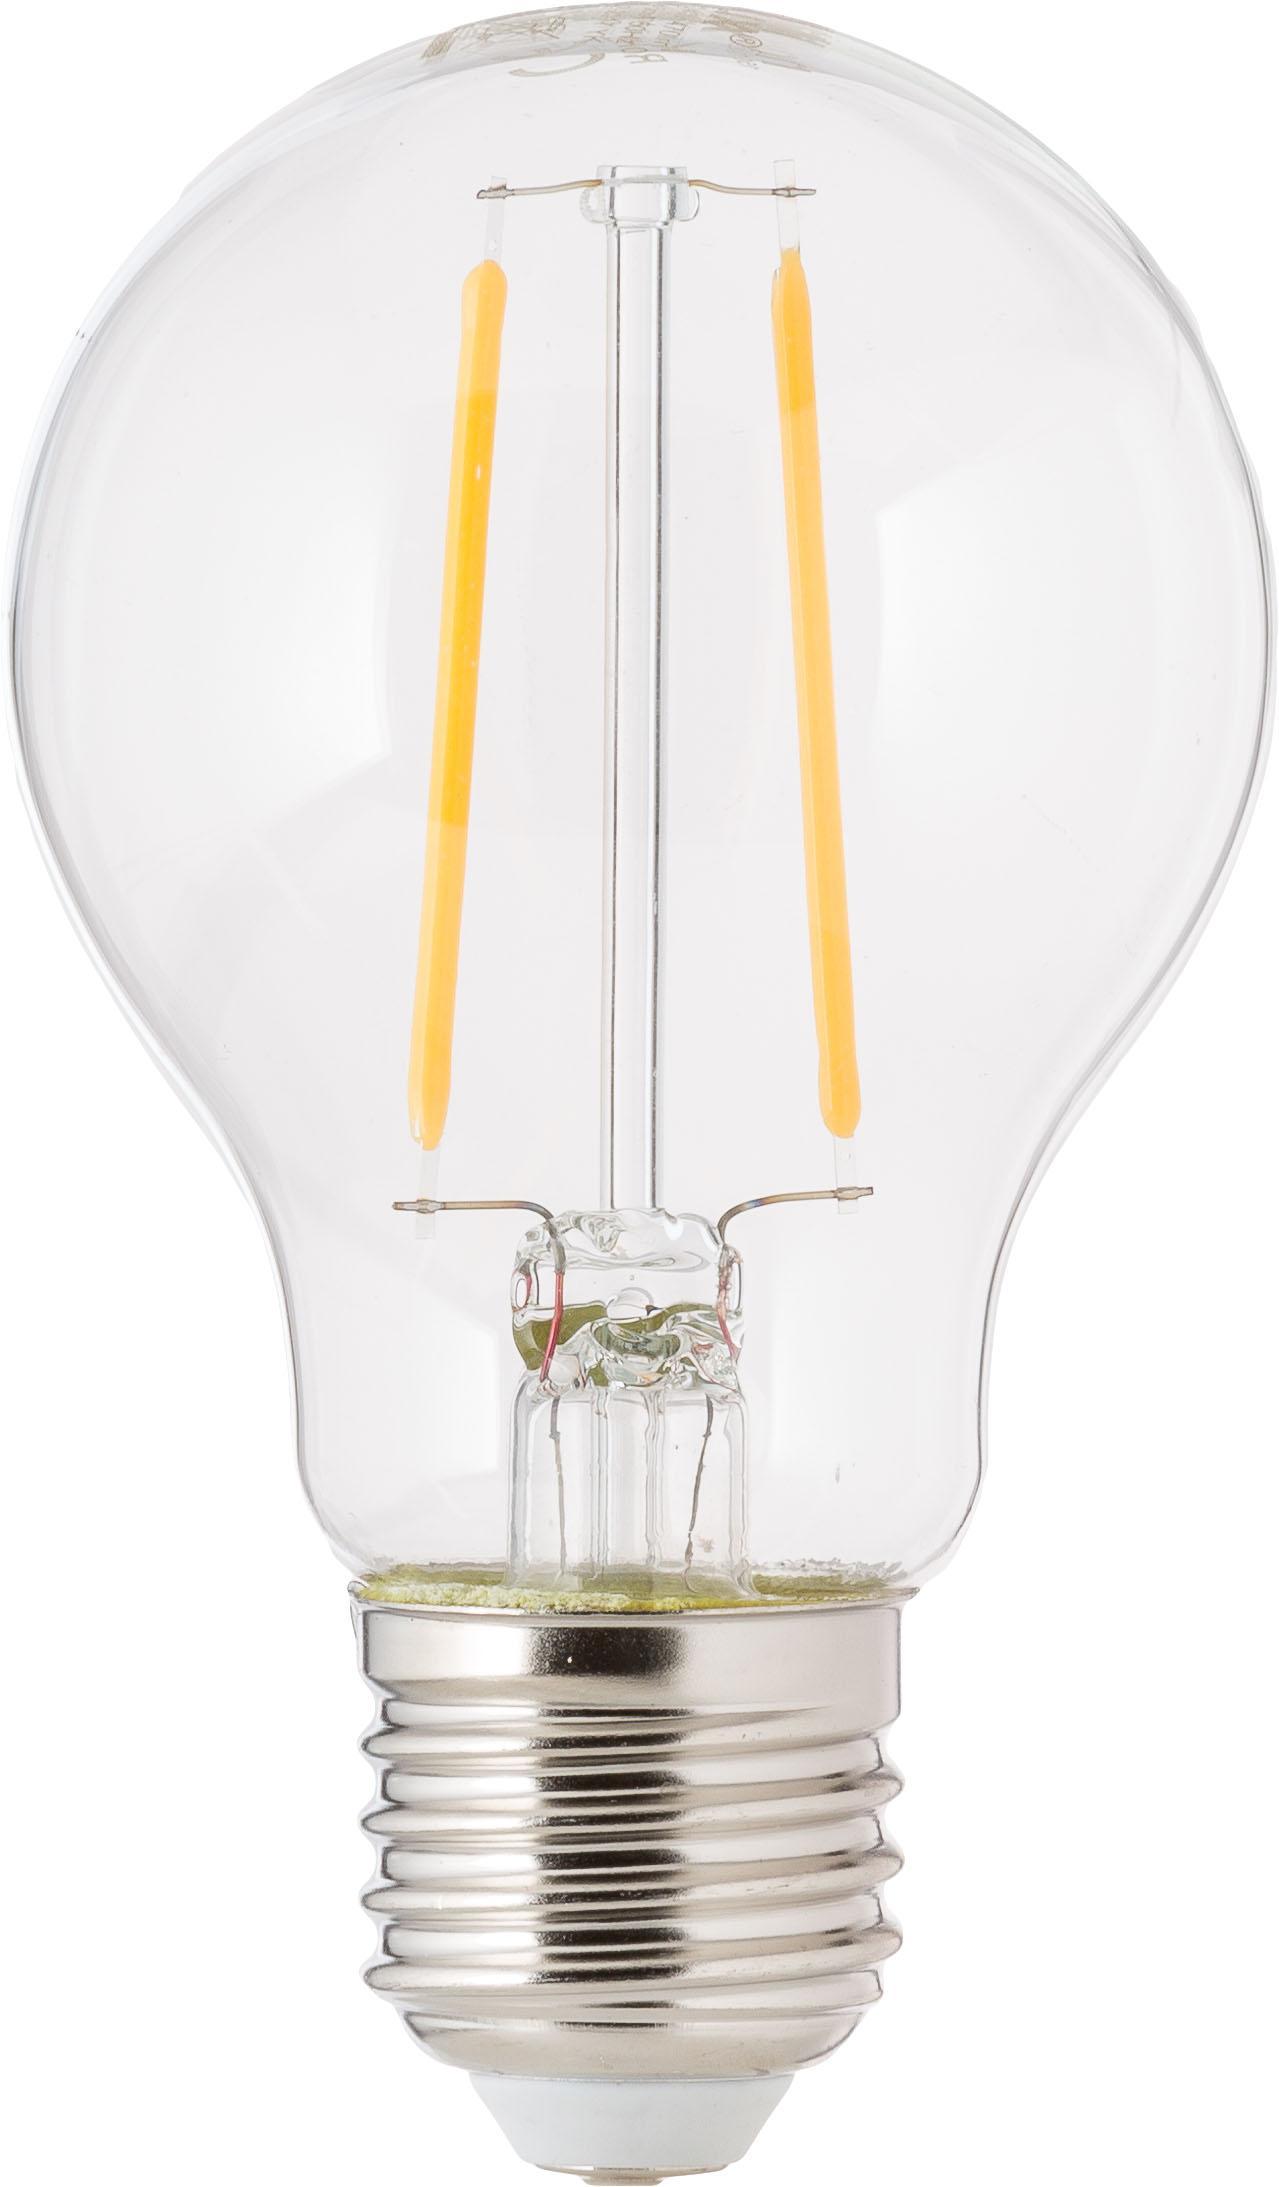 Lampadina a LED Humiel (E27 / 4,6Watt) 6 pz, Lampadina: vetro, Trasparente, Ø 8 x Alt. 10 cm